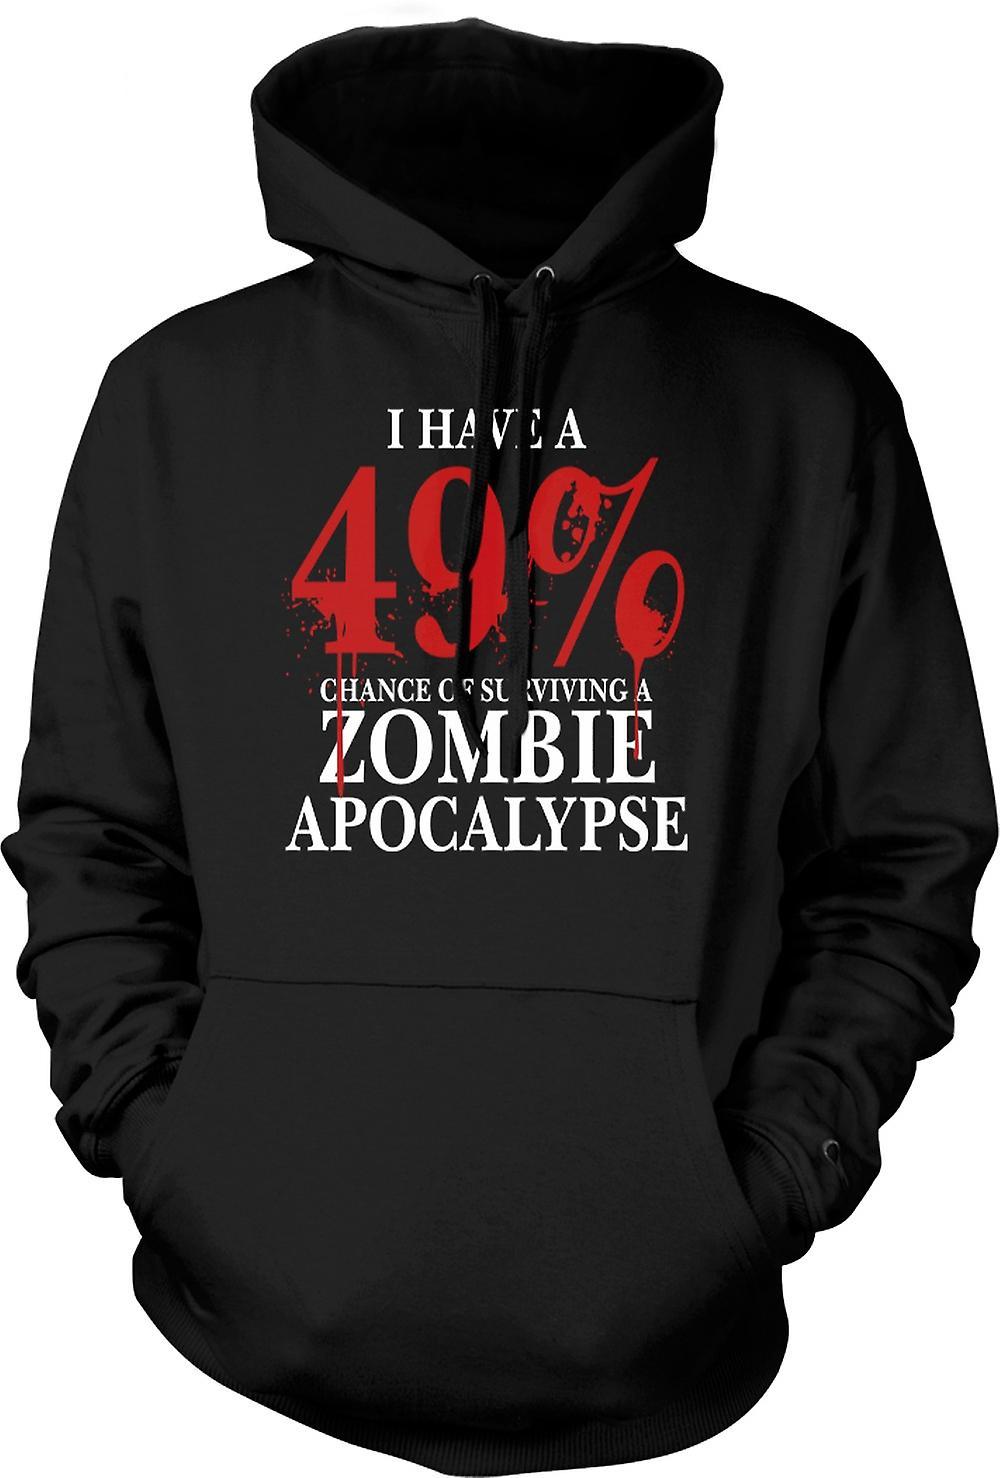 Para hombre con capucha - Apocalipsis Zombie 49% - Horror divertido